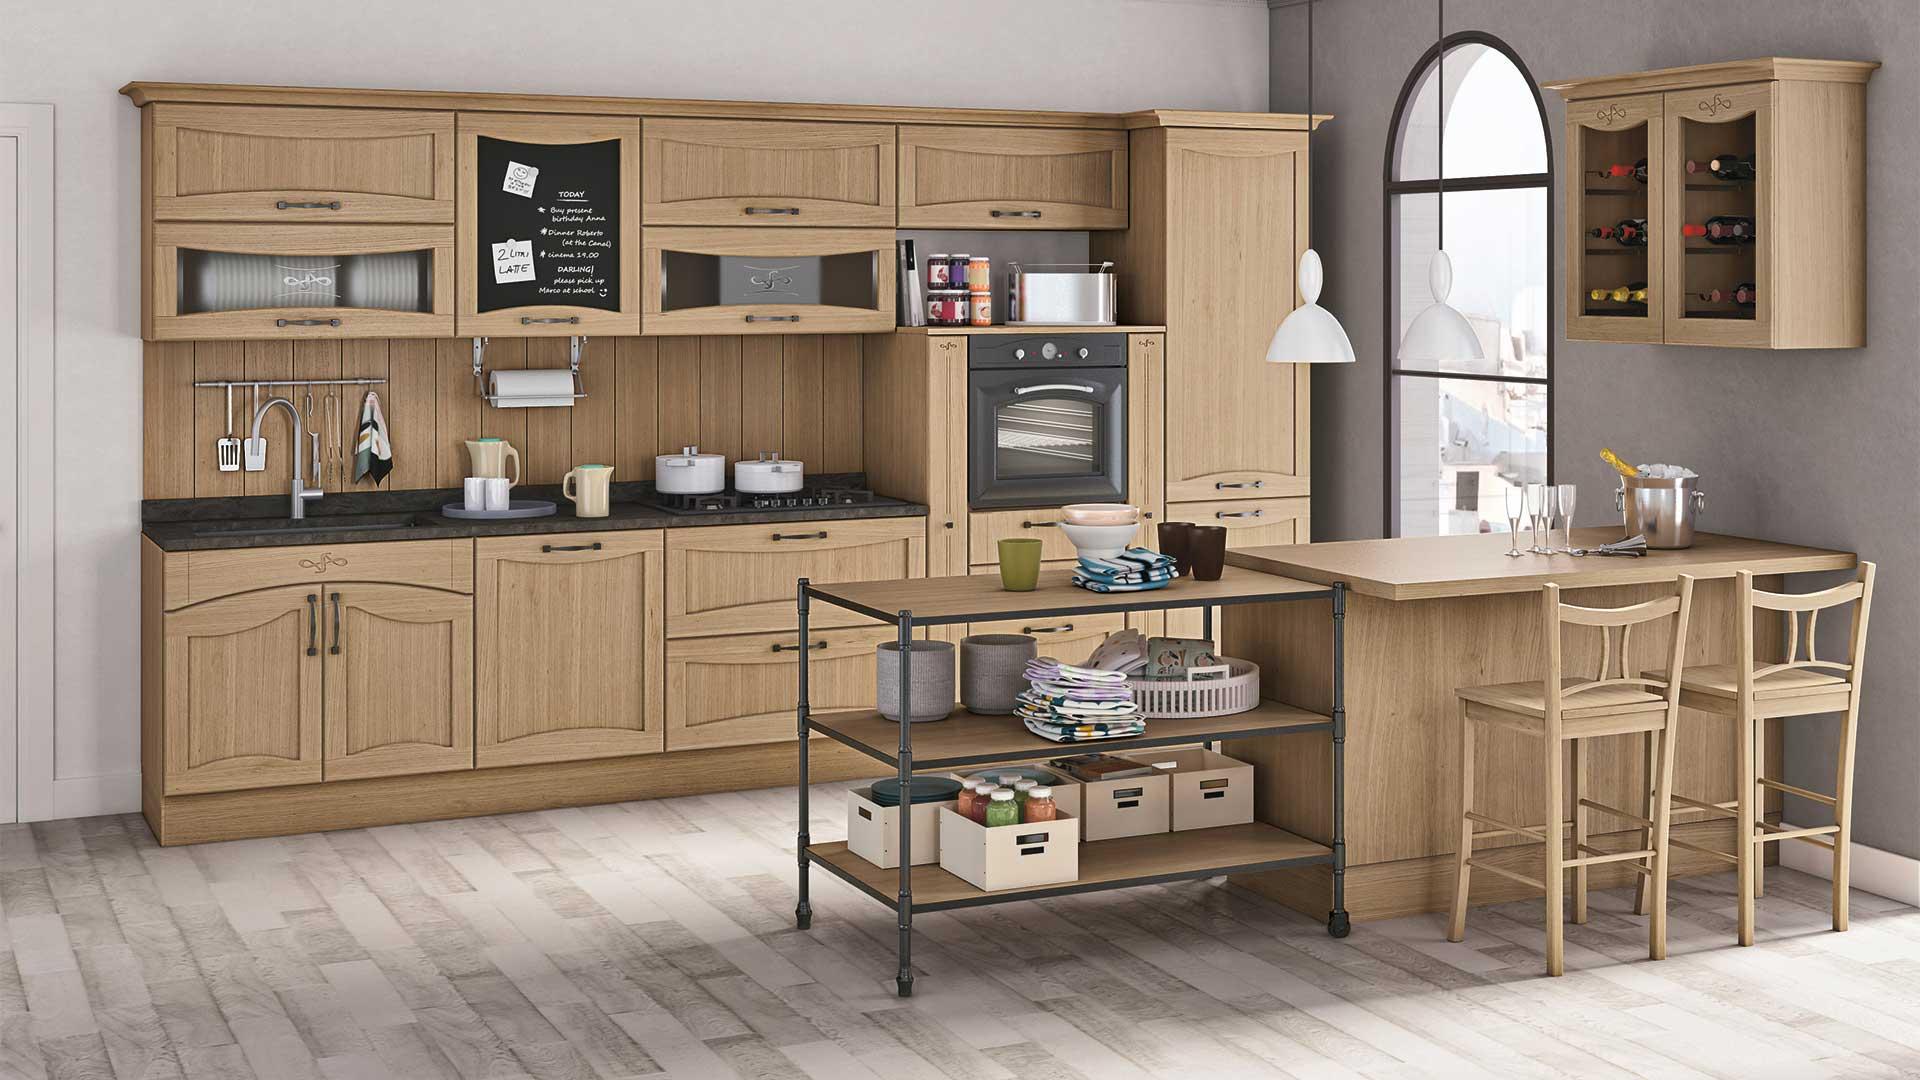 Aurea - Cucine Classiche - Creo Kitchens